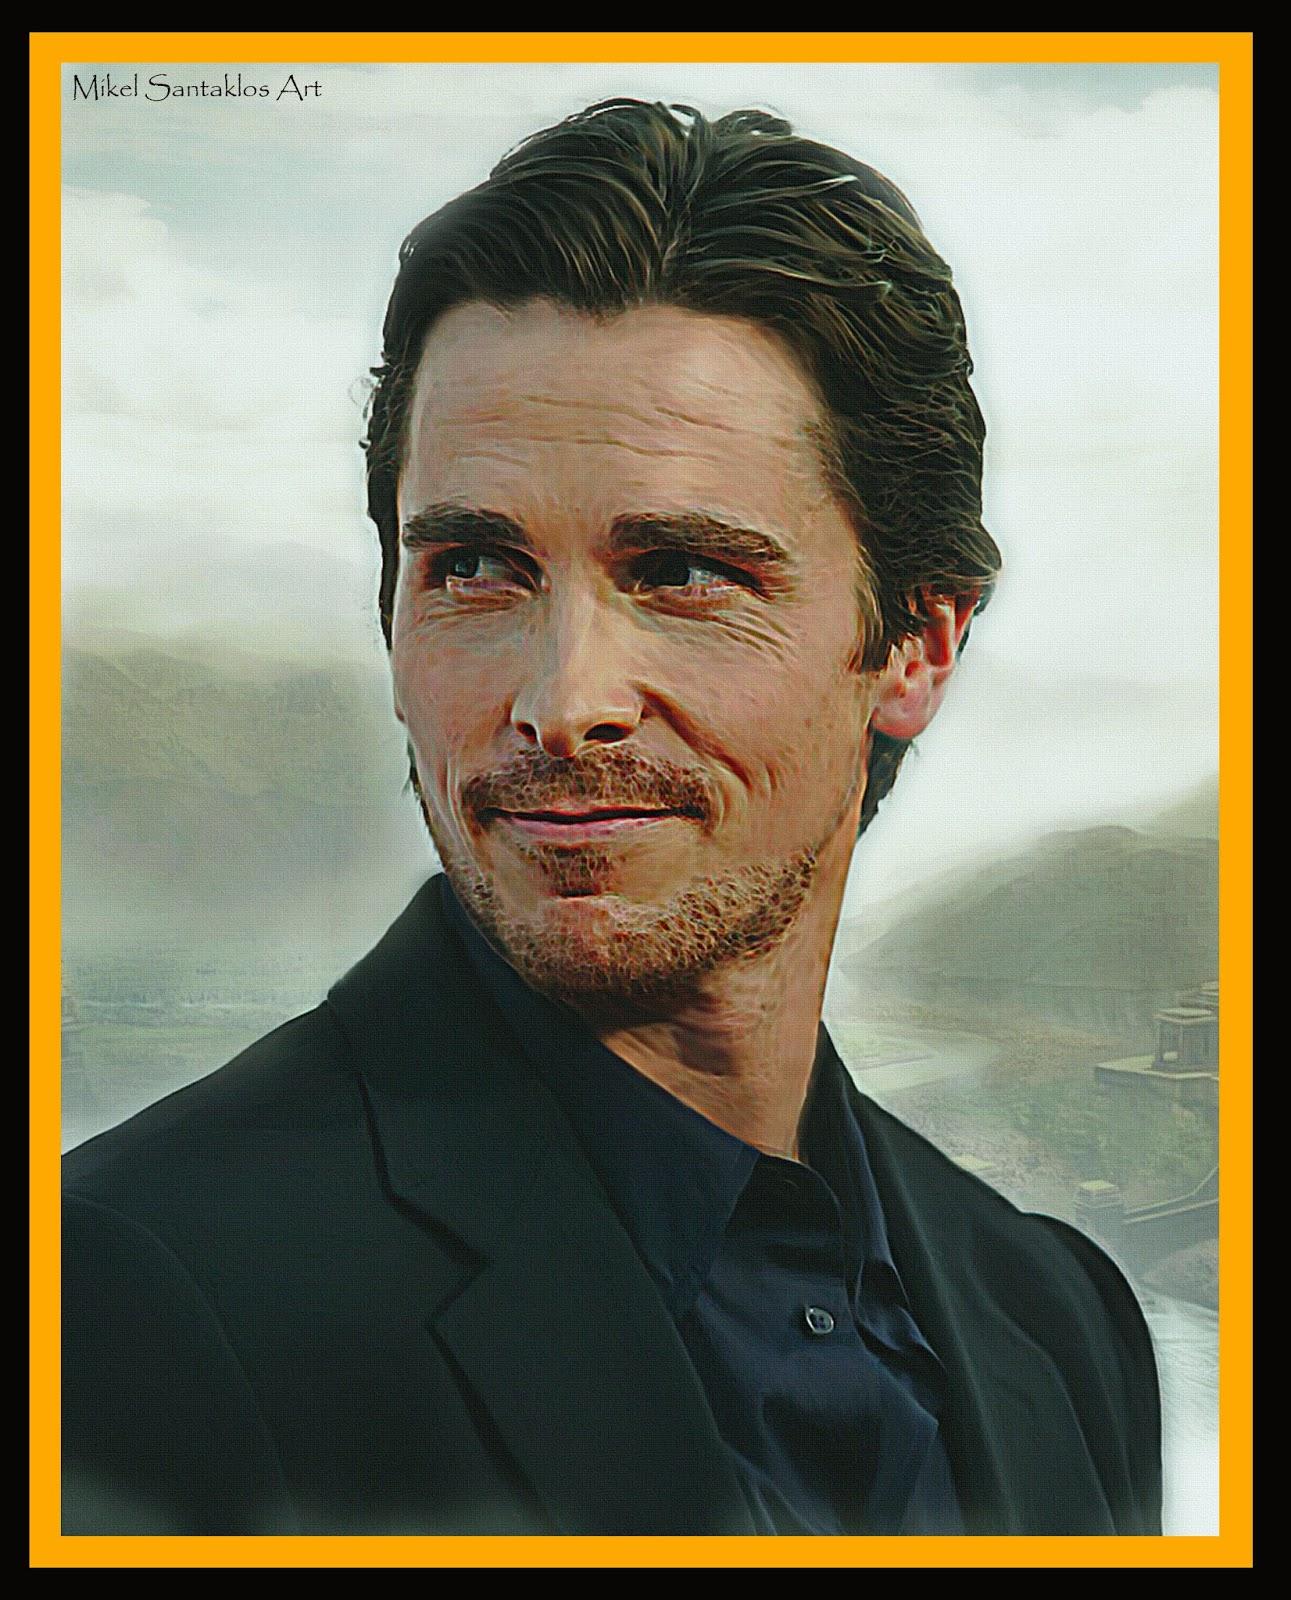 Mikel Santaklos Art : Christian Bale ~ MIKEL SANTAKLOS Art ... Christian Bale